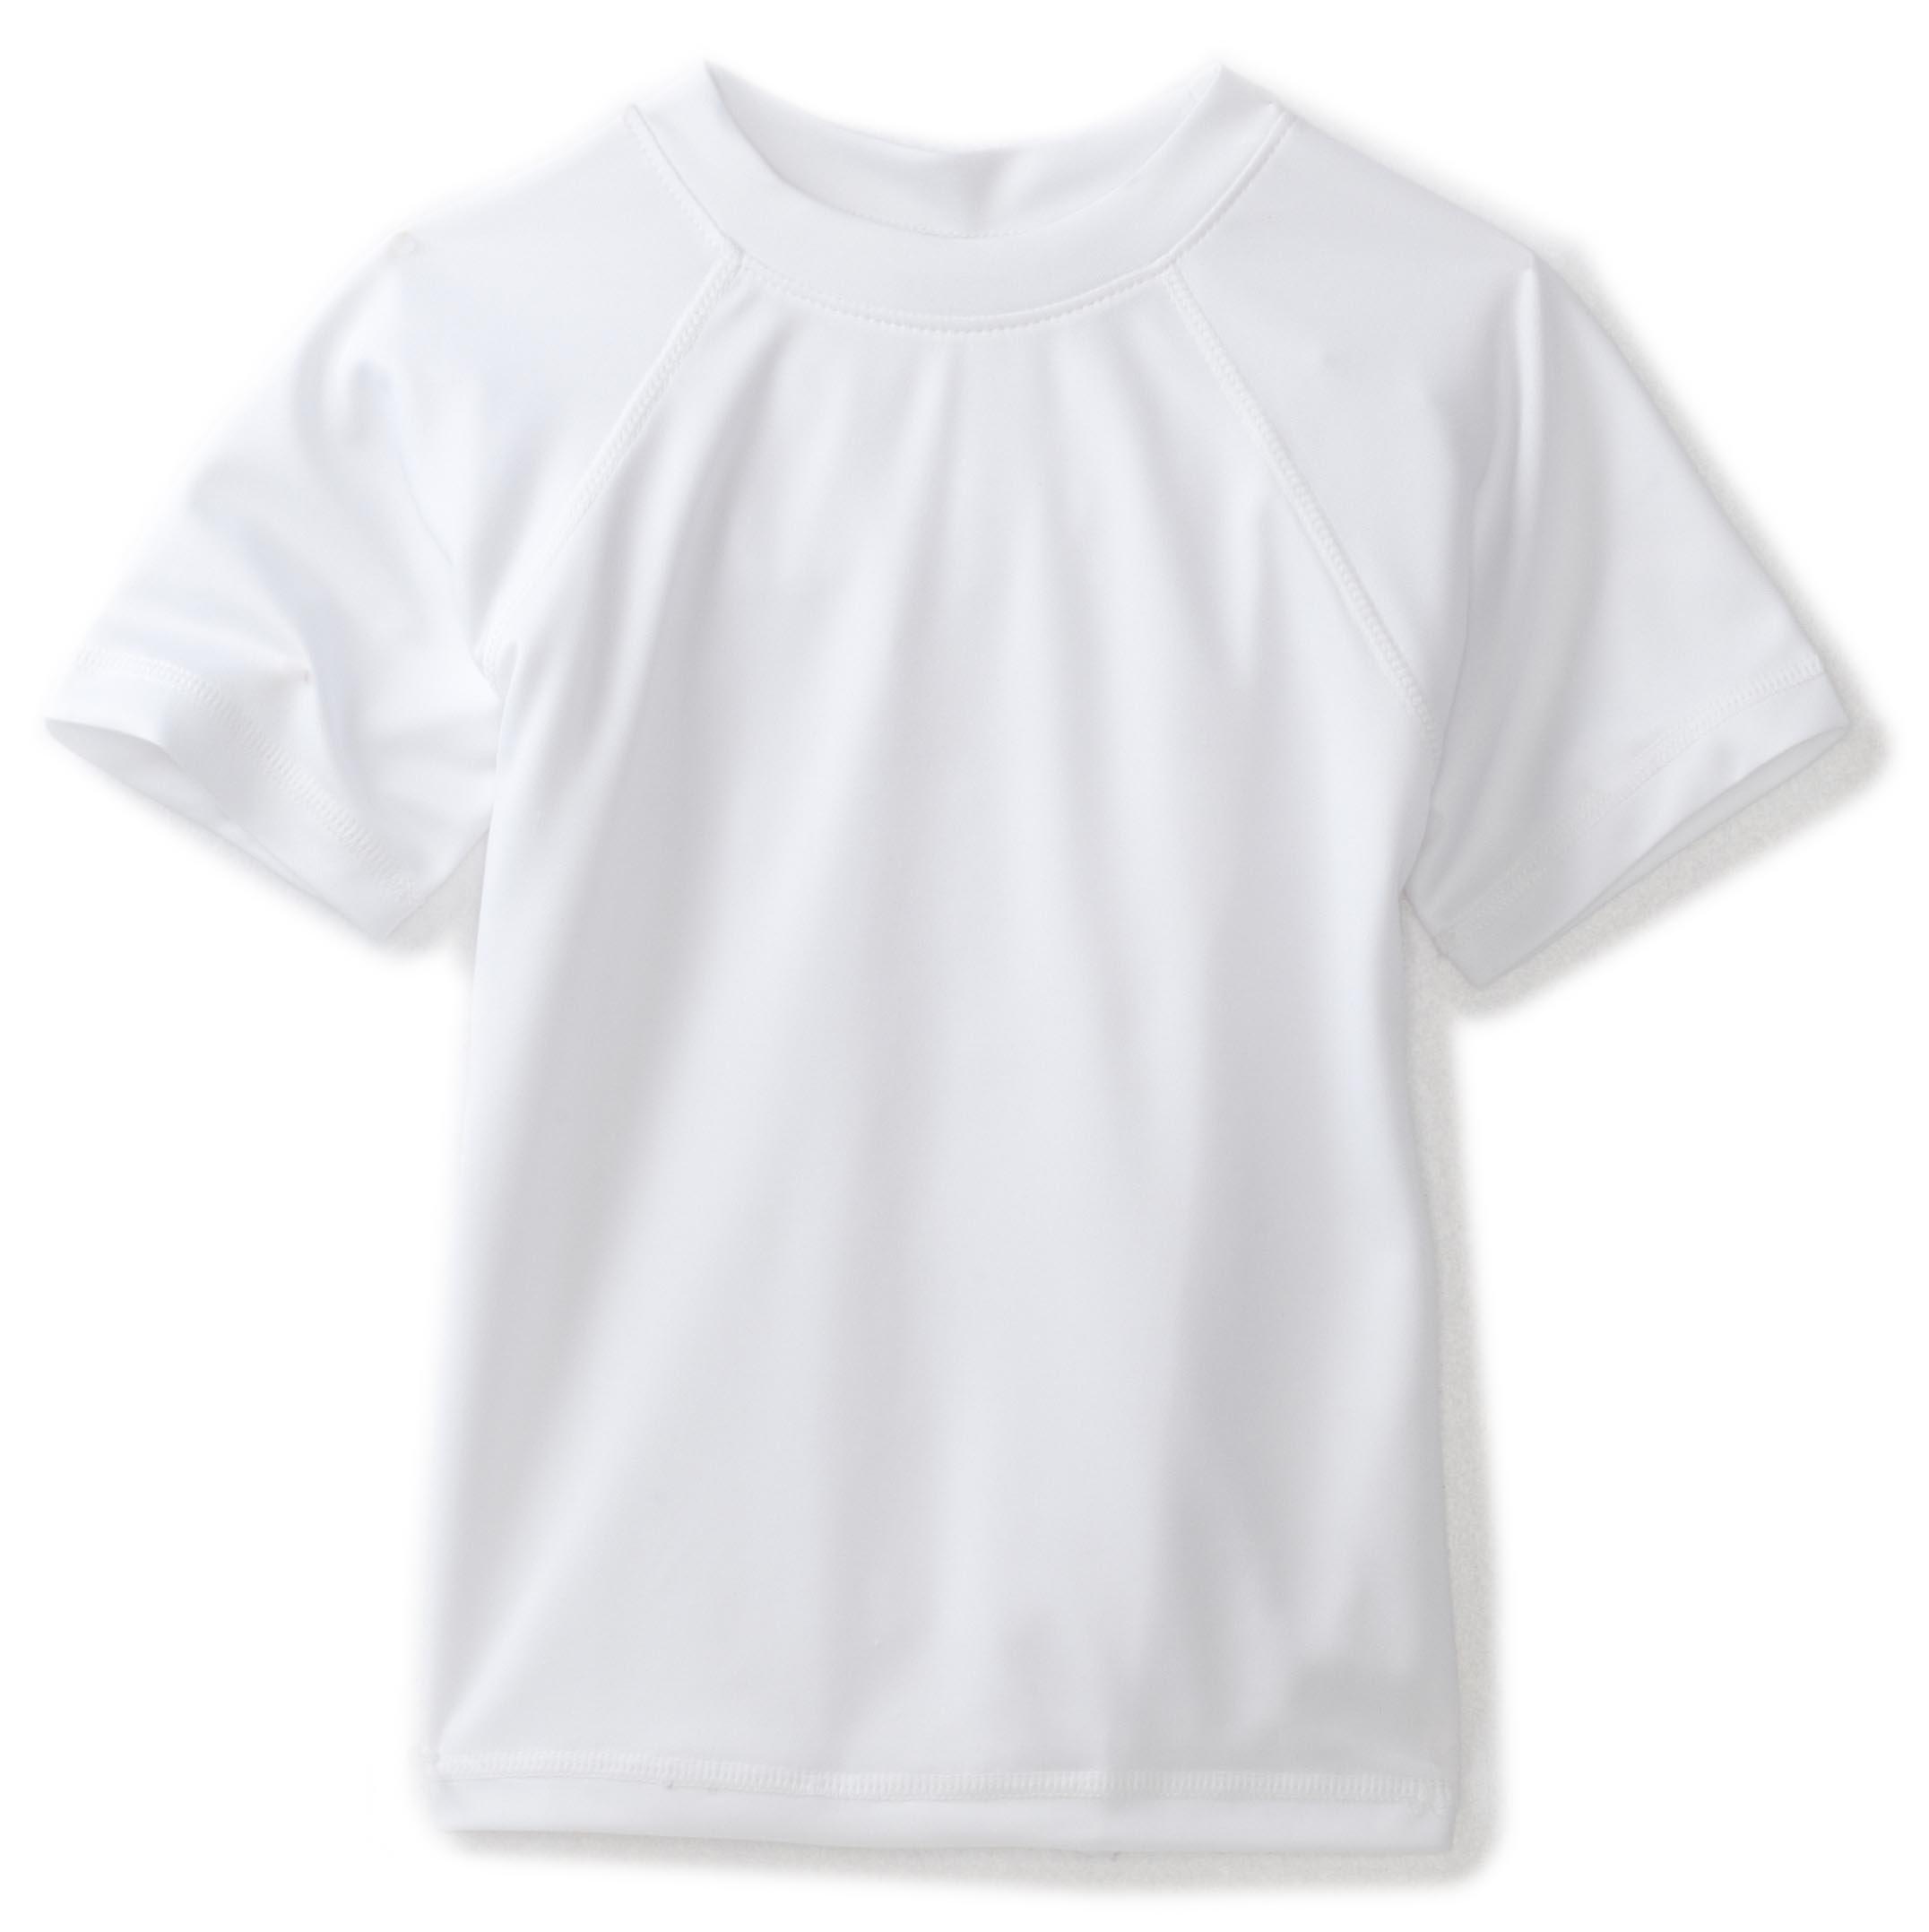 Kanu Surf Toddler Boys' Short Sleeve UPF 50+ Rashguard Swim Shirt, Solid White, 4T